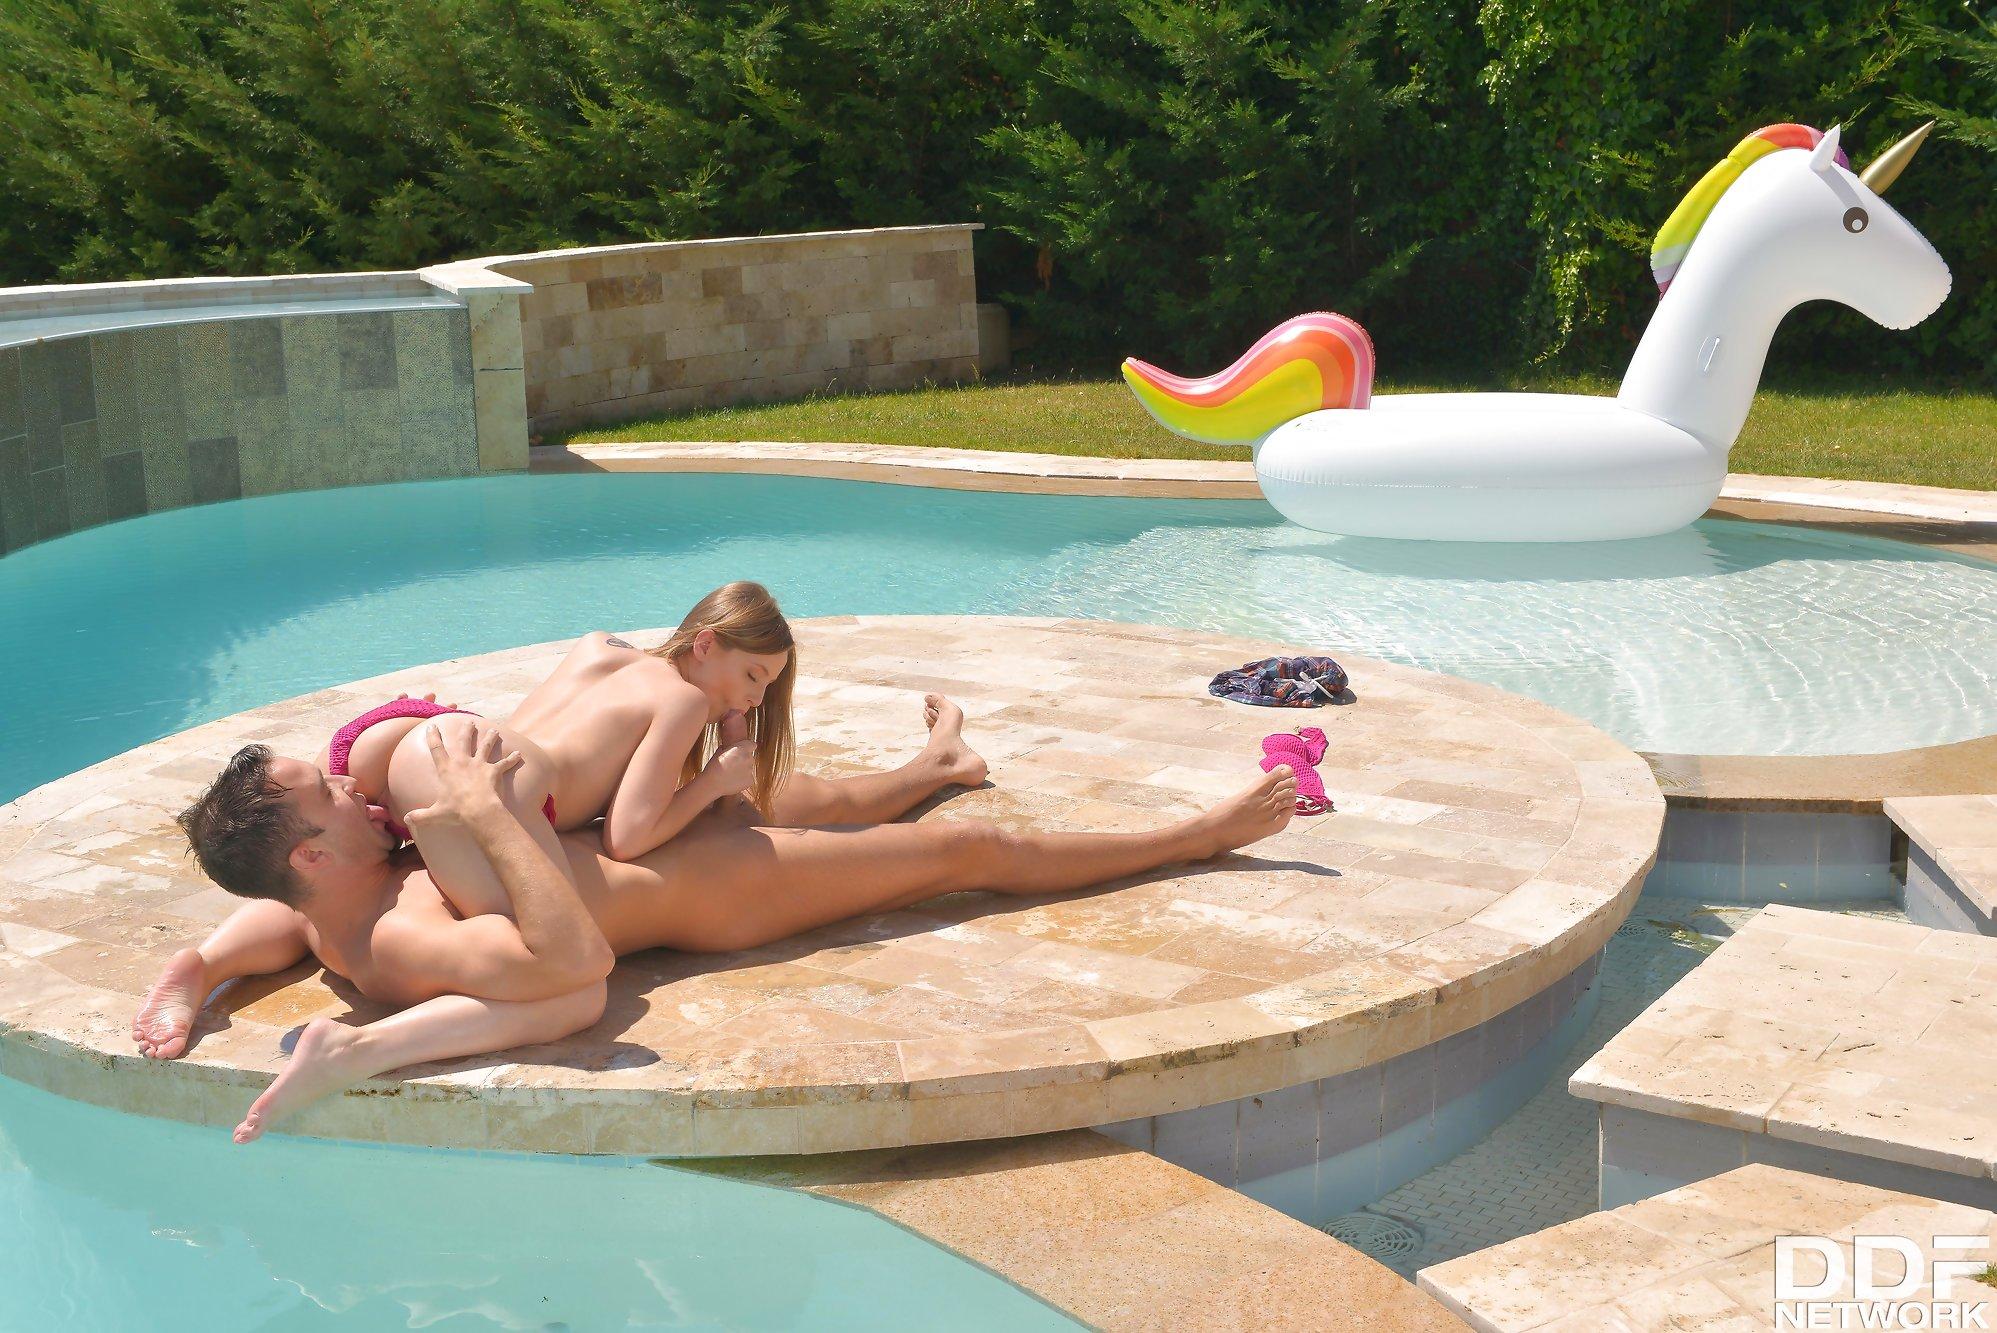 Hot Teen Banged: Hardcore Boy-Girl Fuck by the Pool